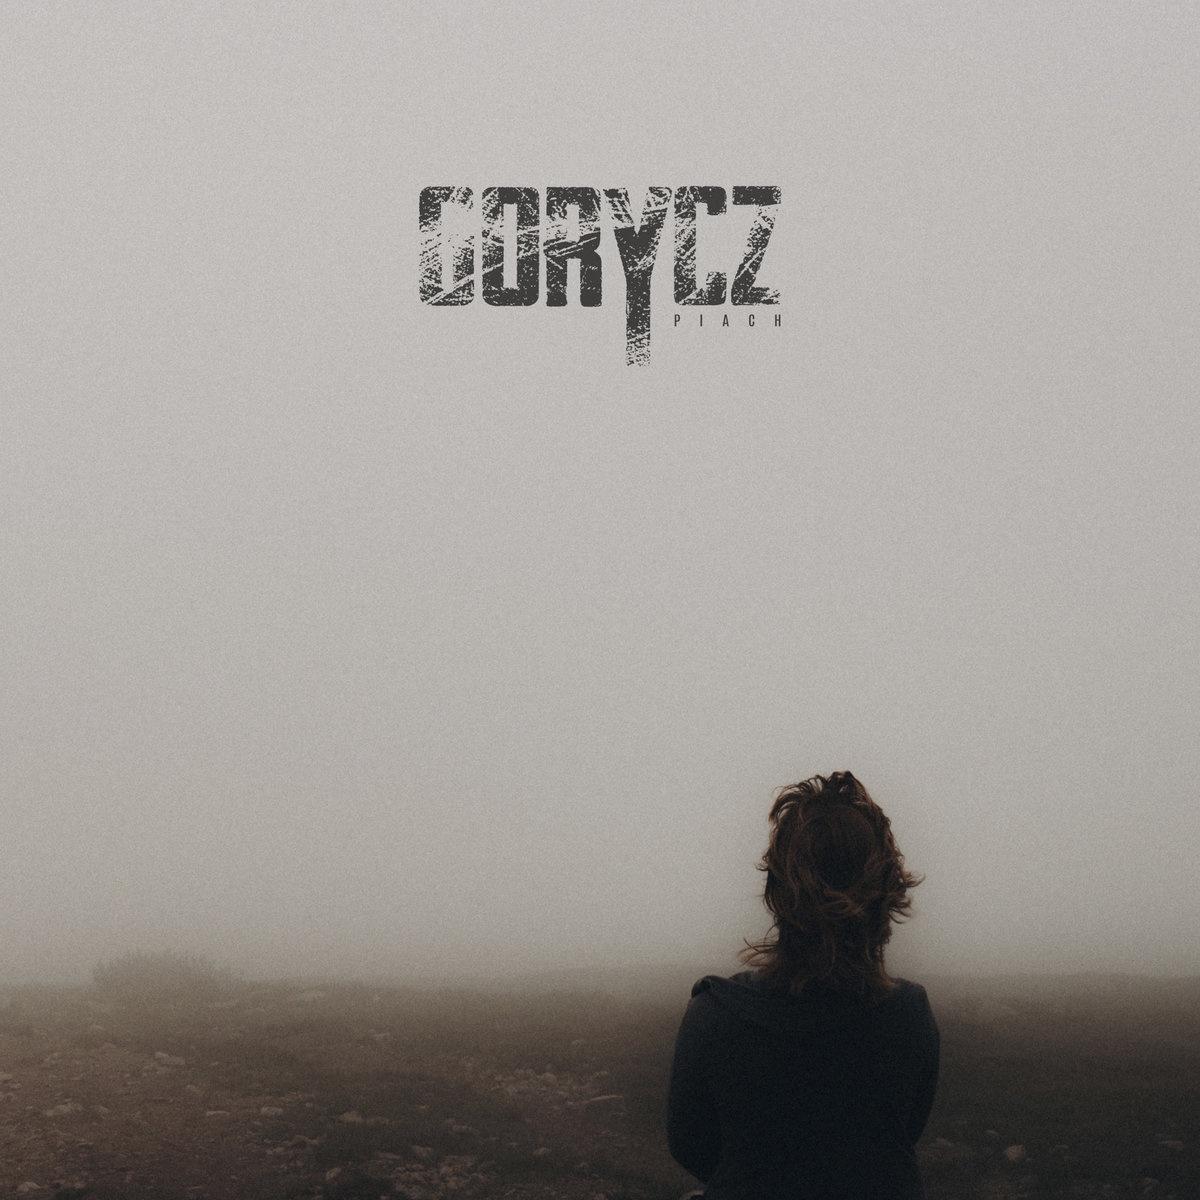 Gorycz - Blackened Drum Groove